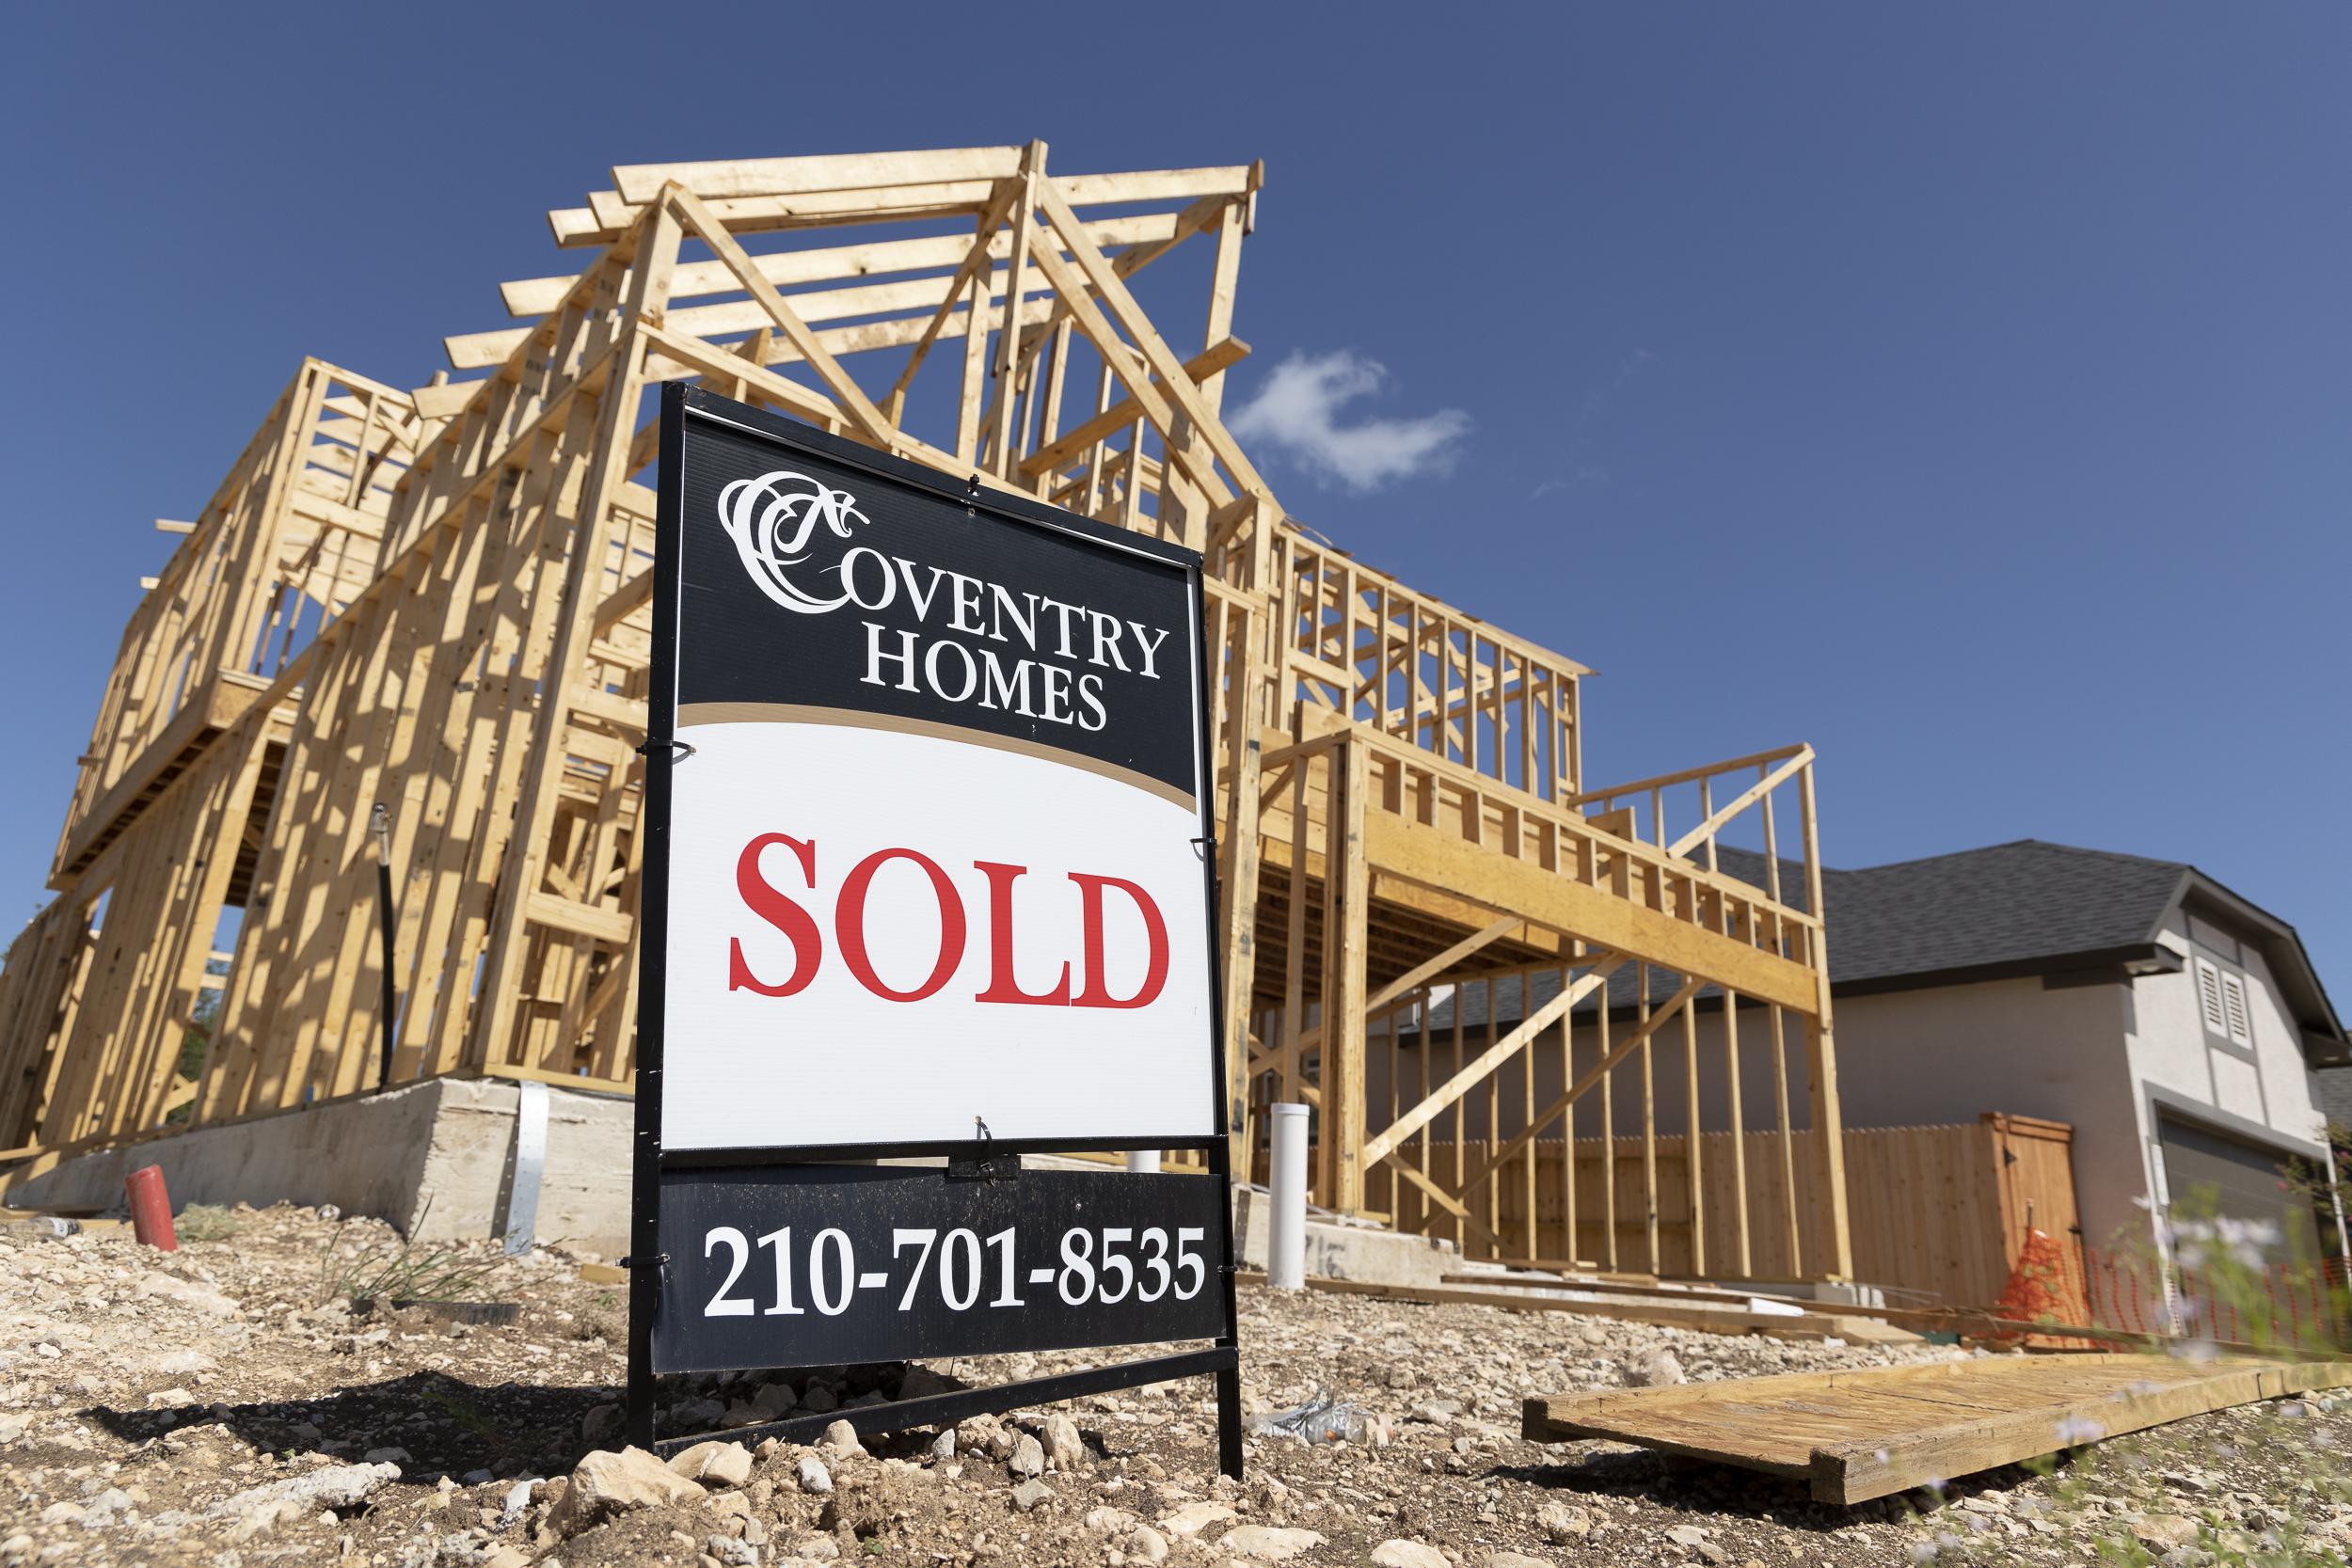 VA tweaks its home loan program for the pandemic era